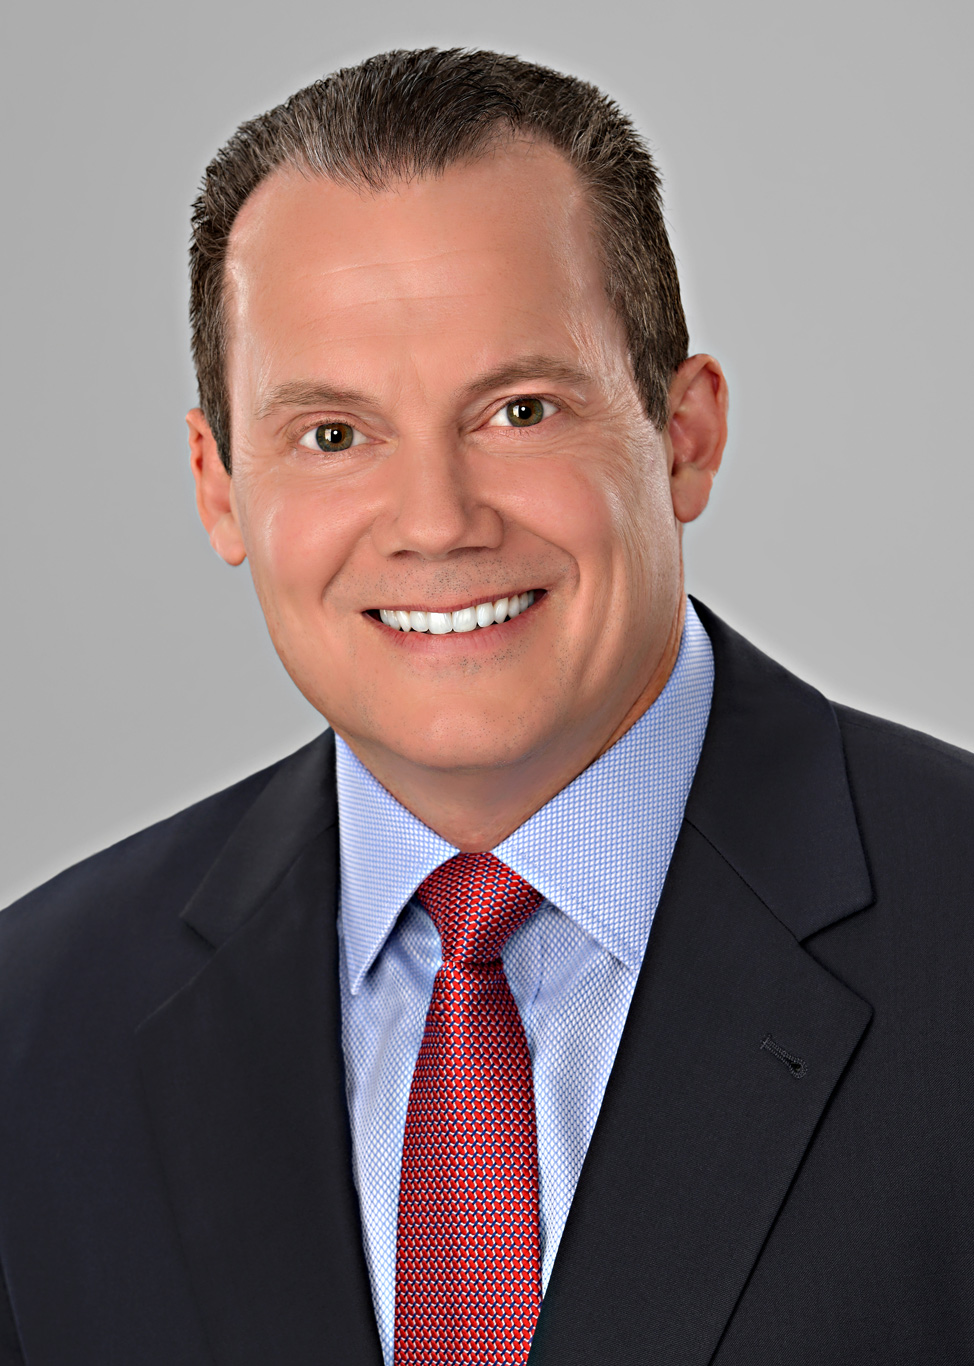 executive headshot portrait for business